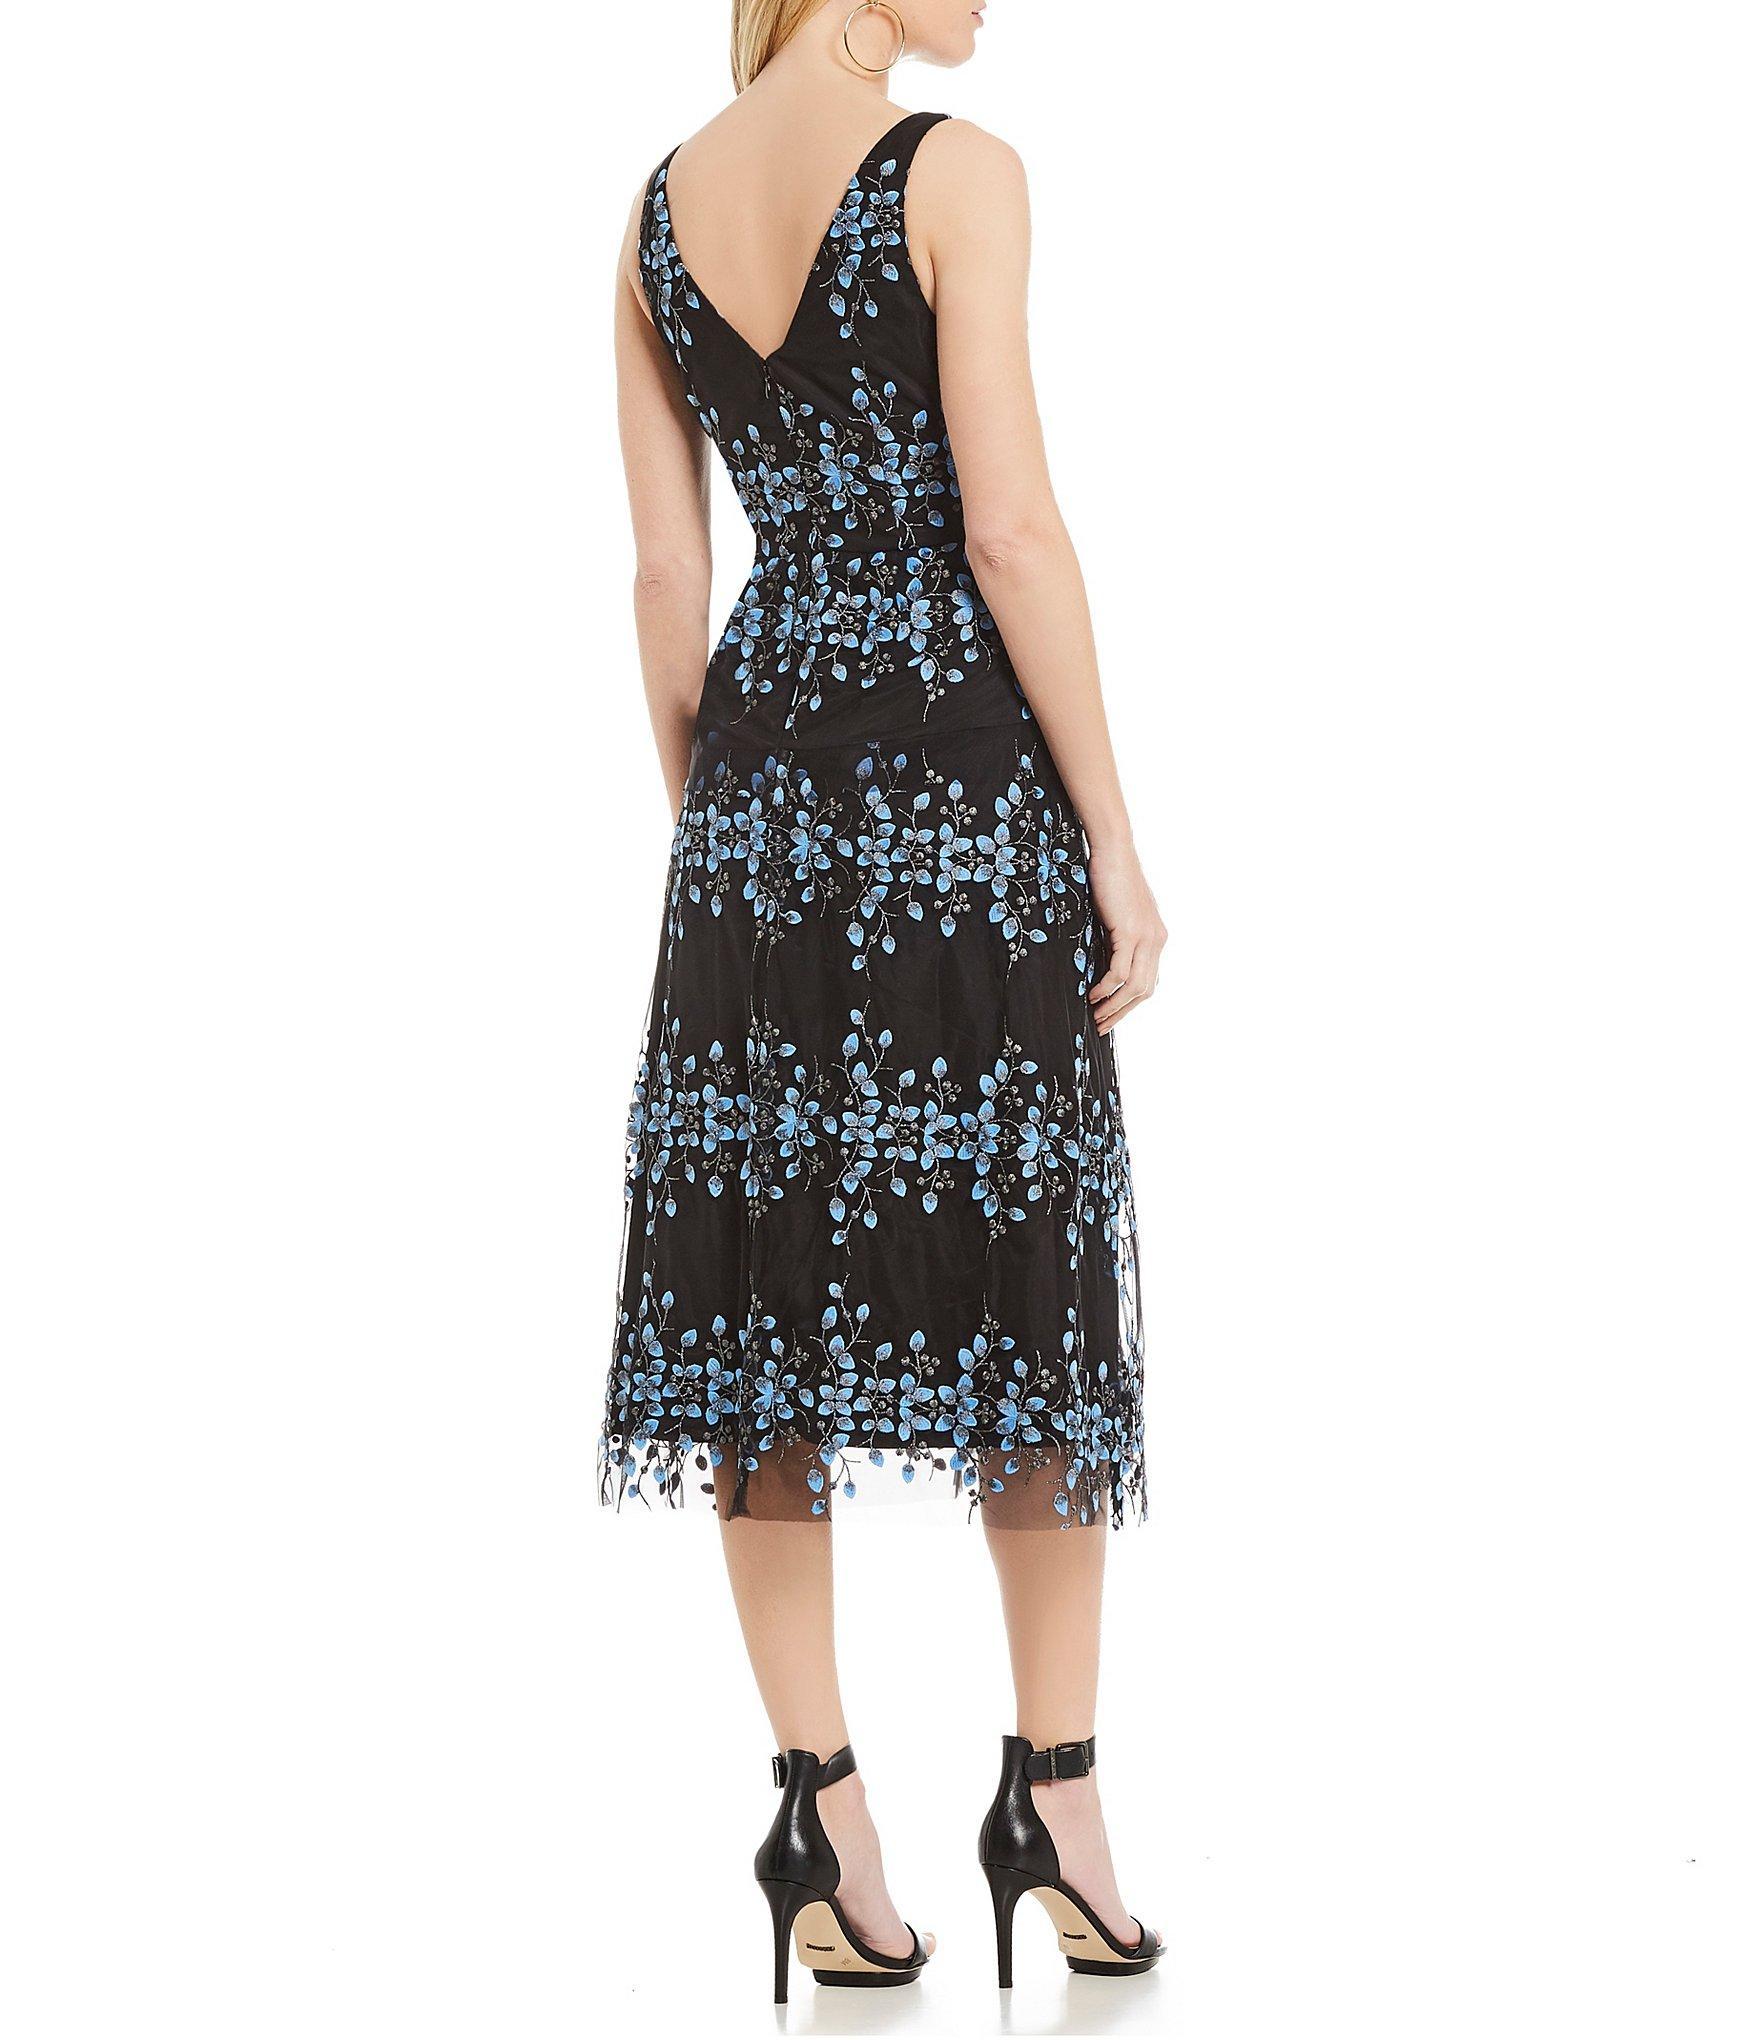 ccf3b98e25 Gianni Bini - Black Emily Embroidered Midi Dress - Lyst. View fullscreen